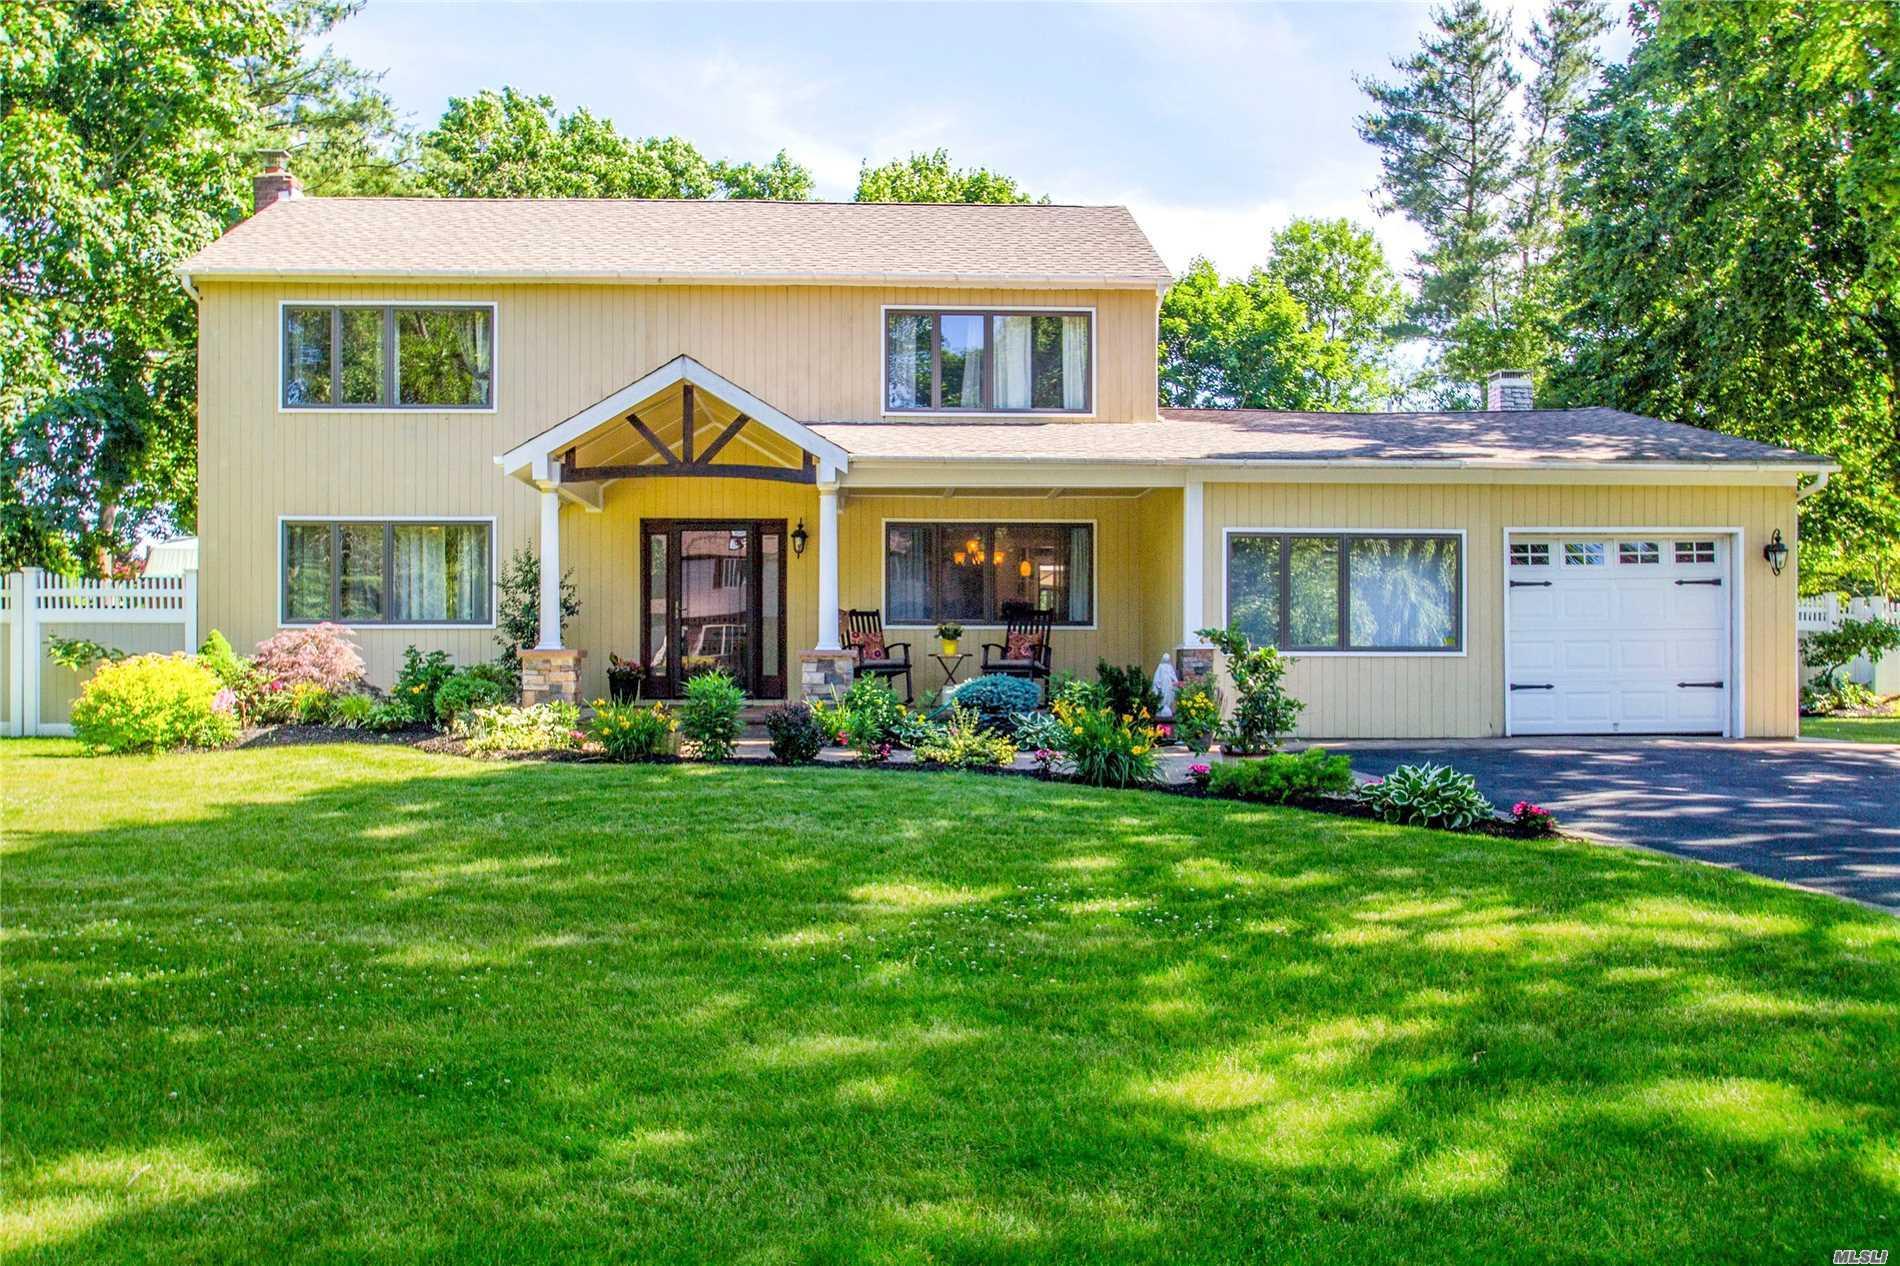 Photo of home for sale at 4 Manor Ln, Stony Brook NY